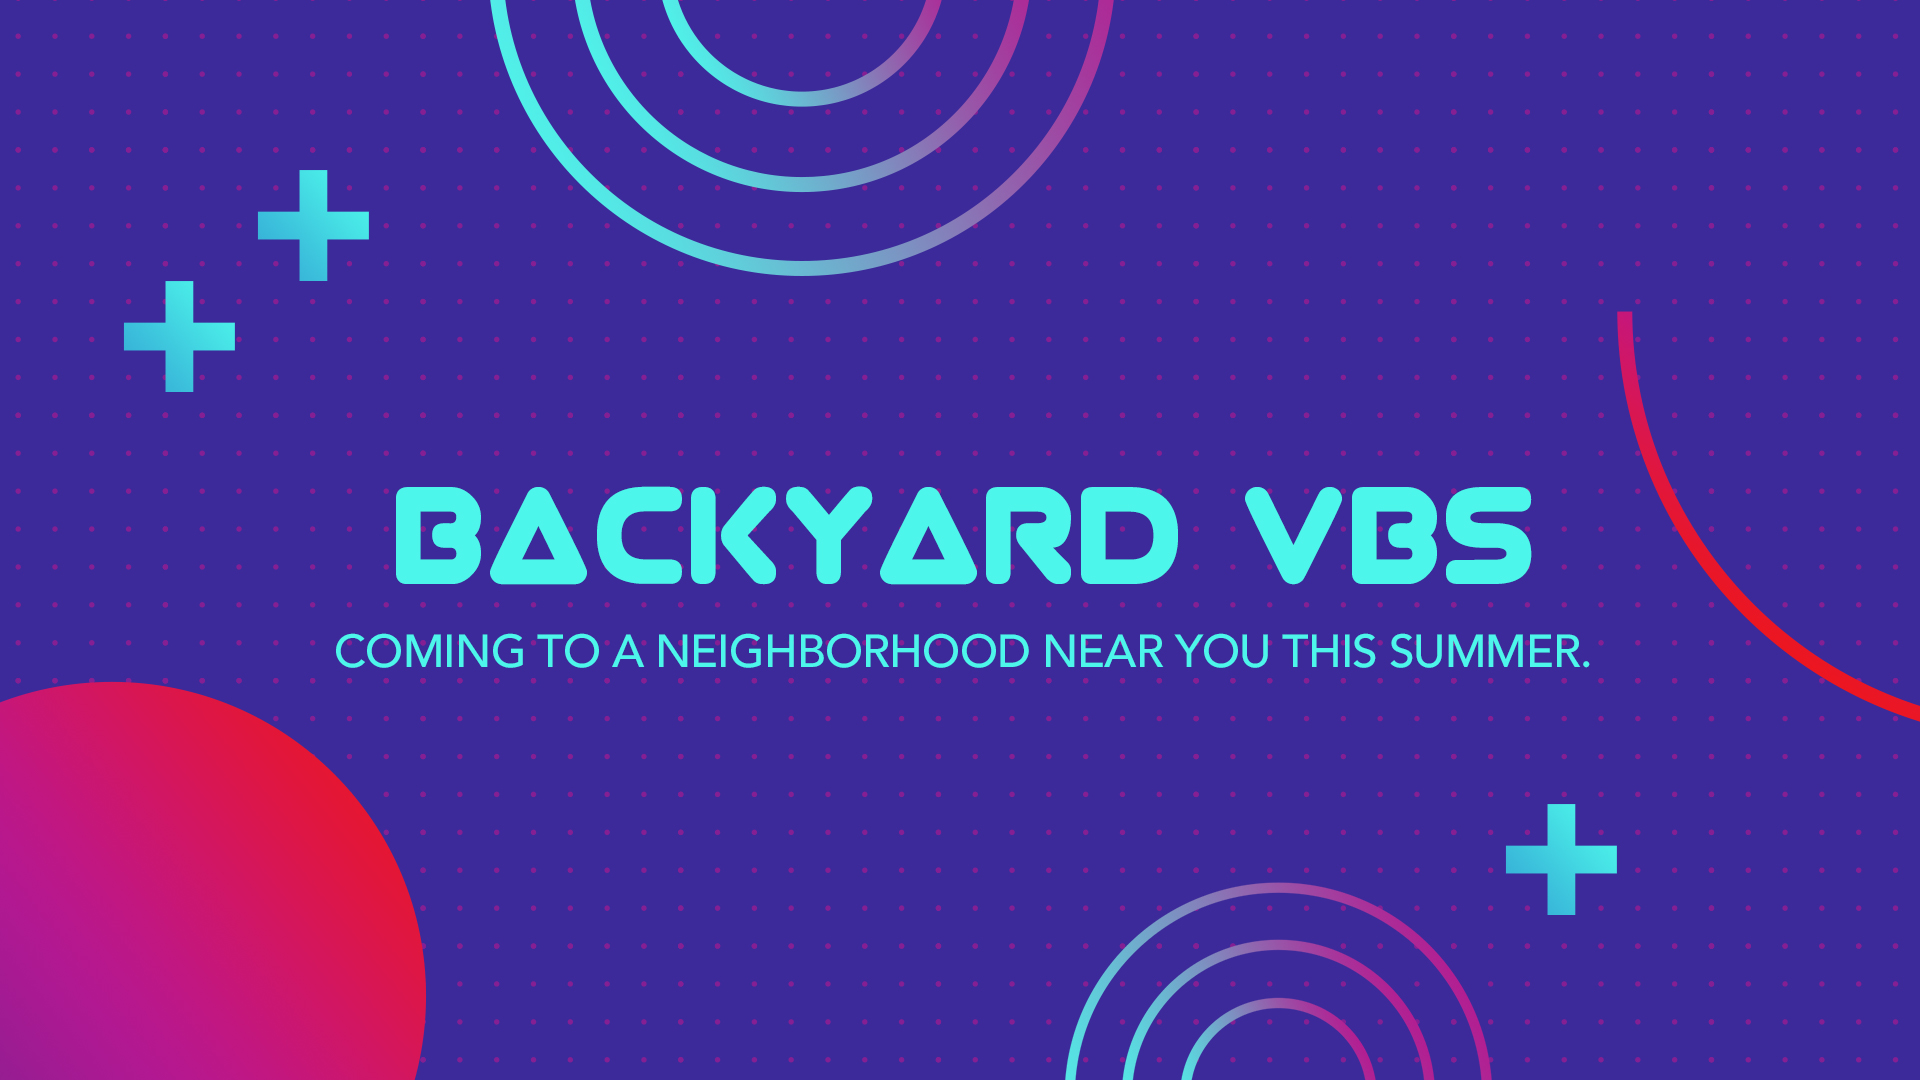 Backyard VBS